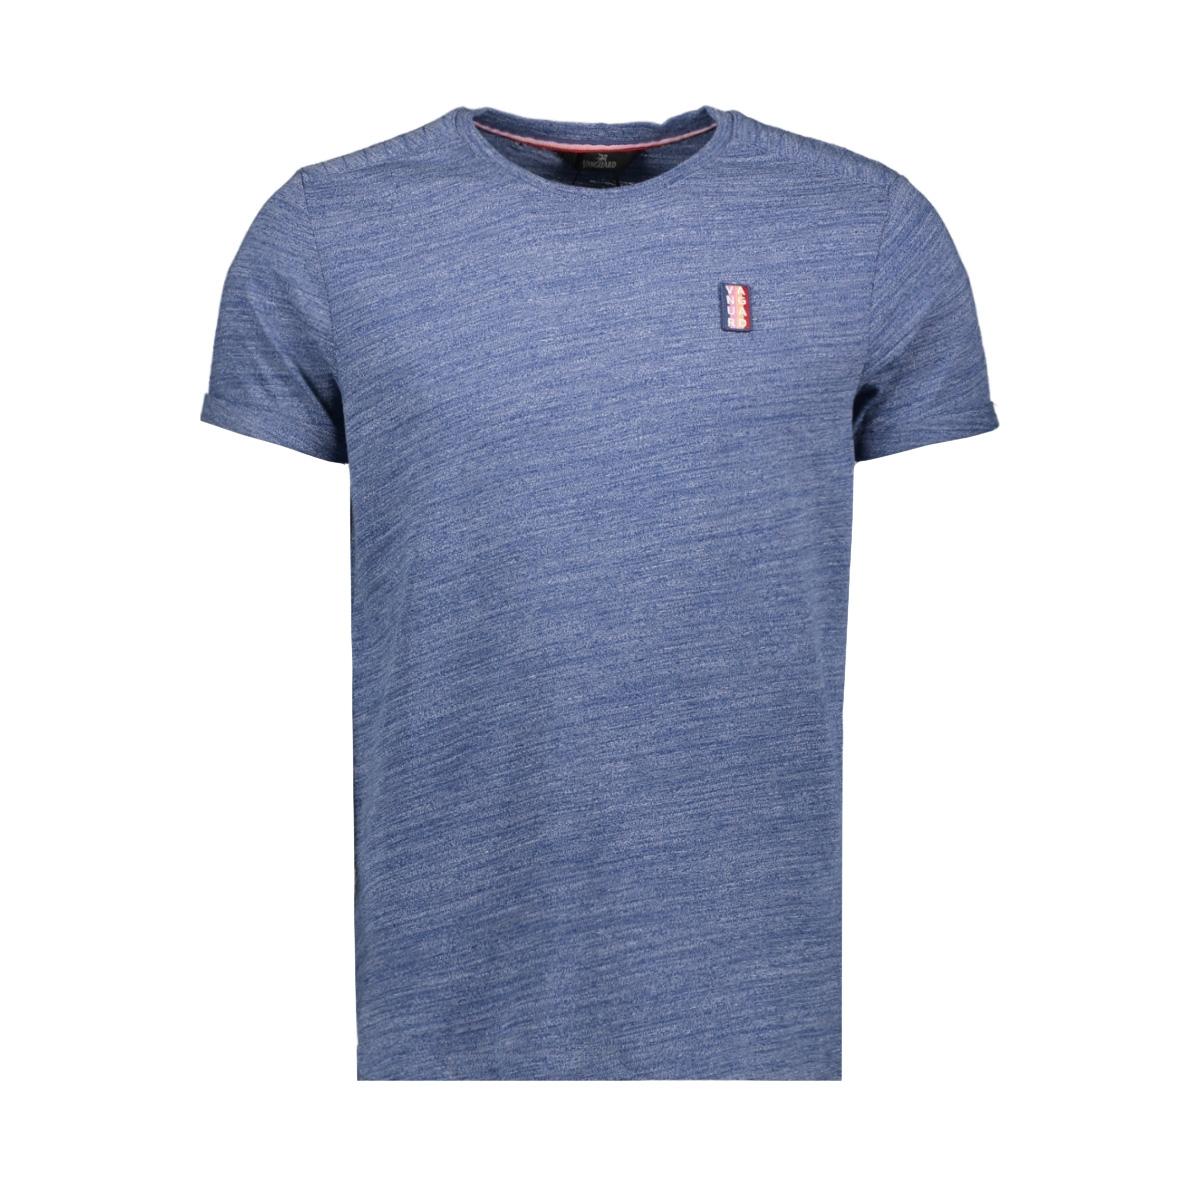 r neck t shirt with badge vtss203542 vanguard t-shirt 5054